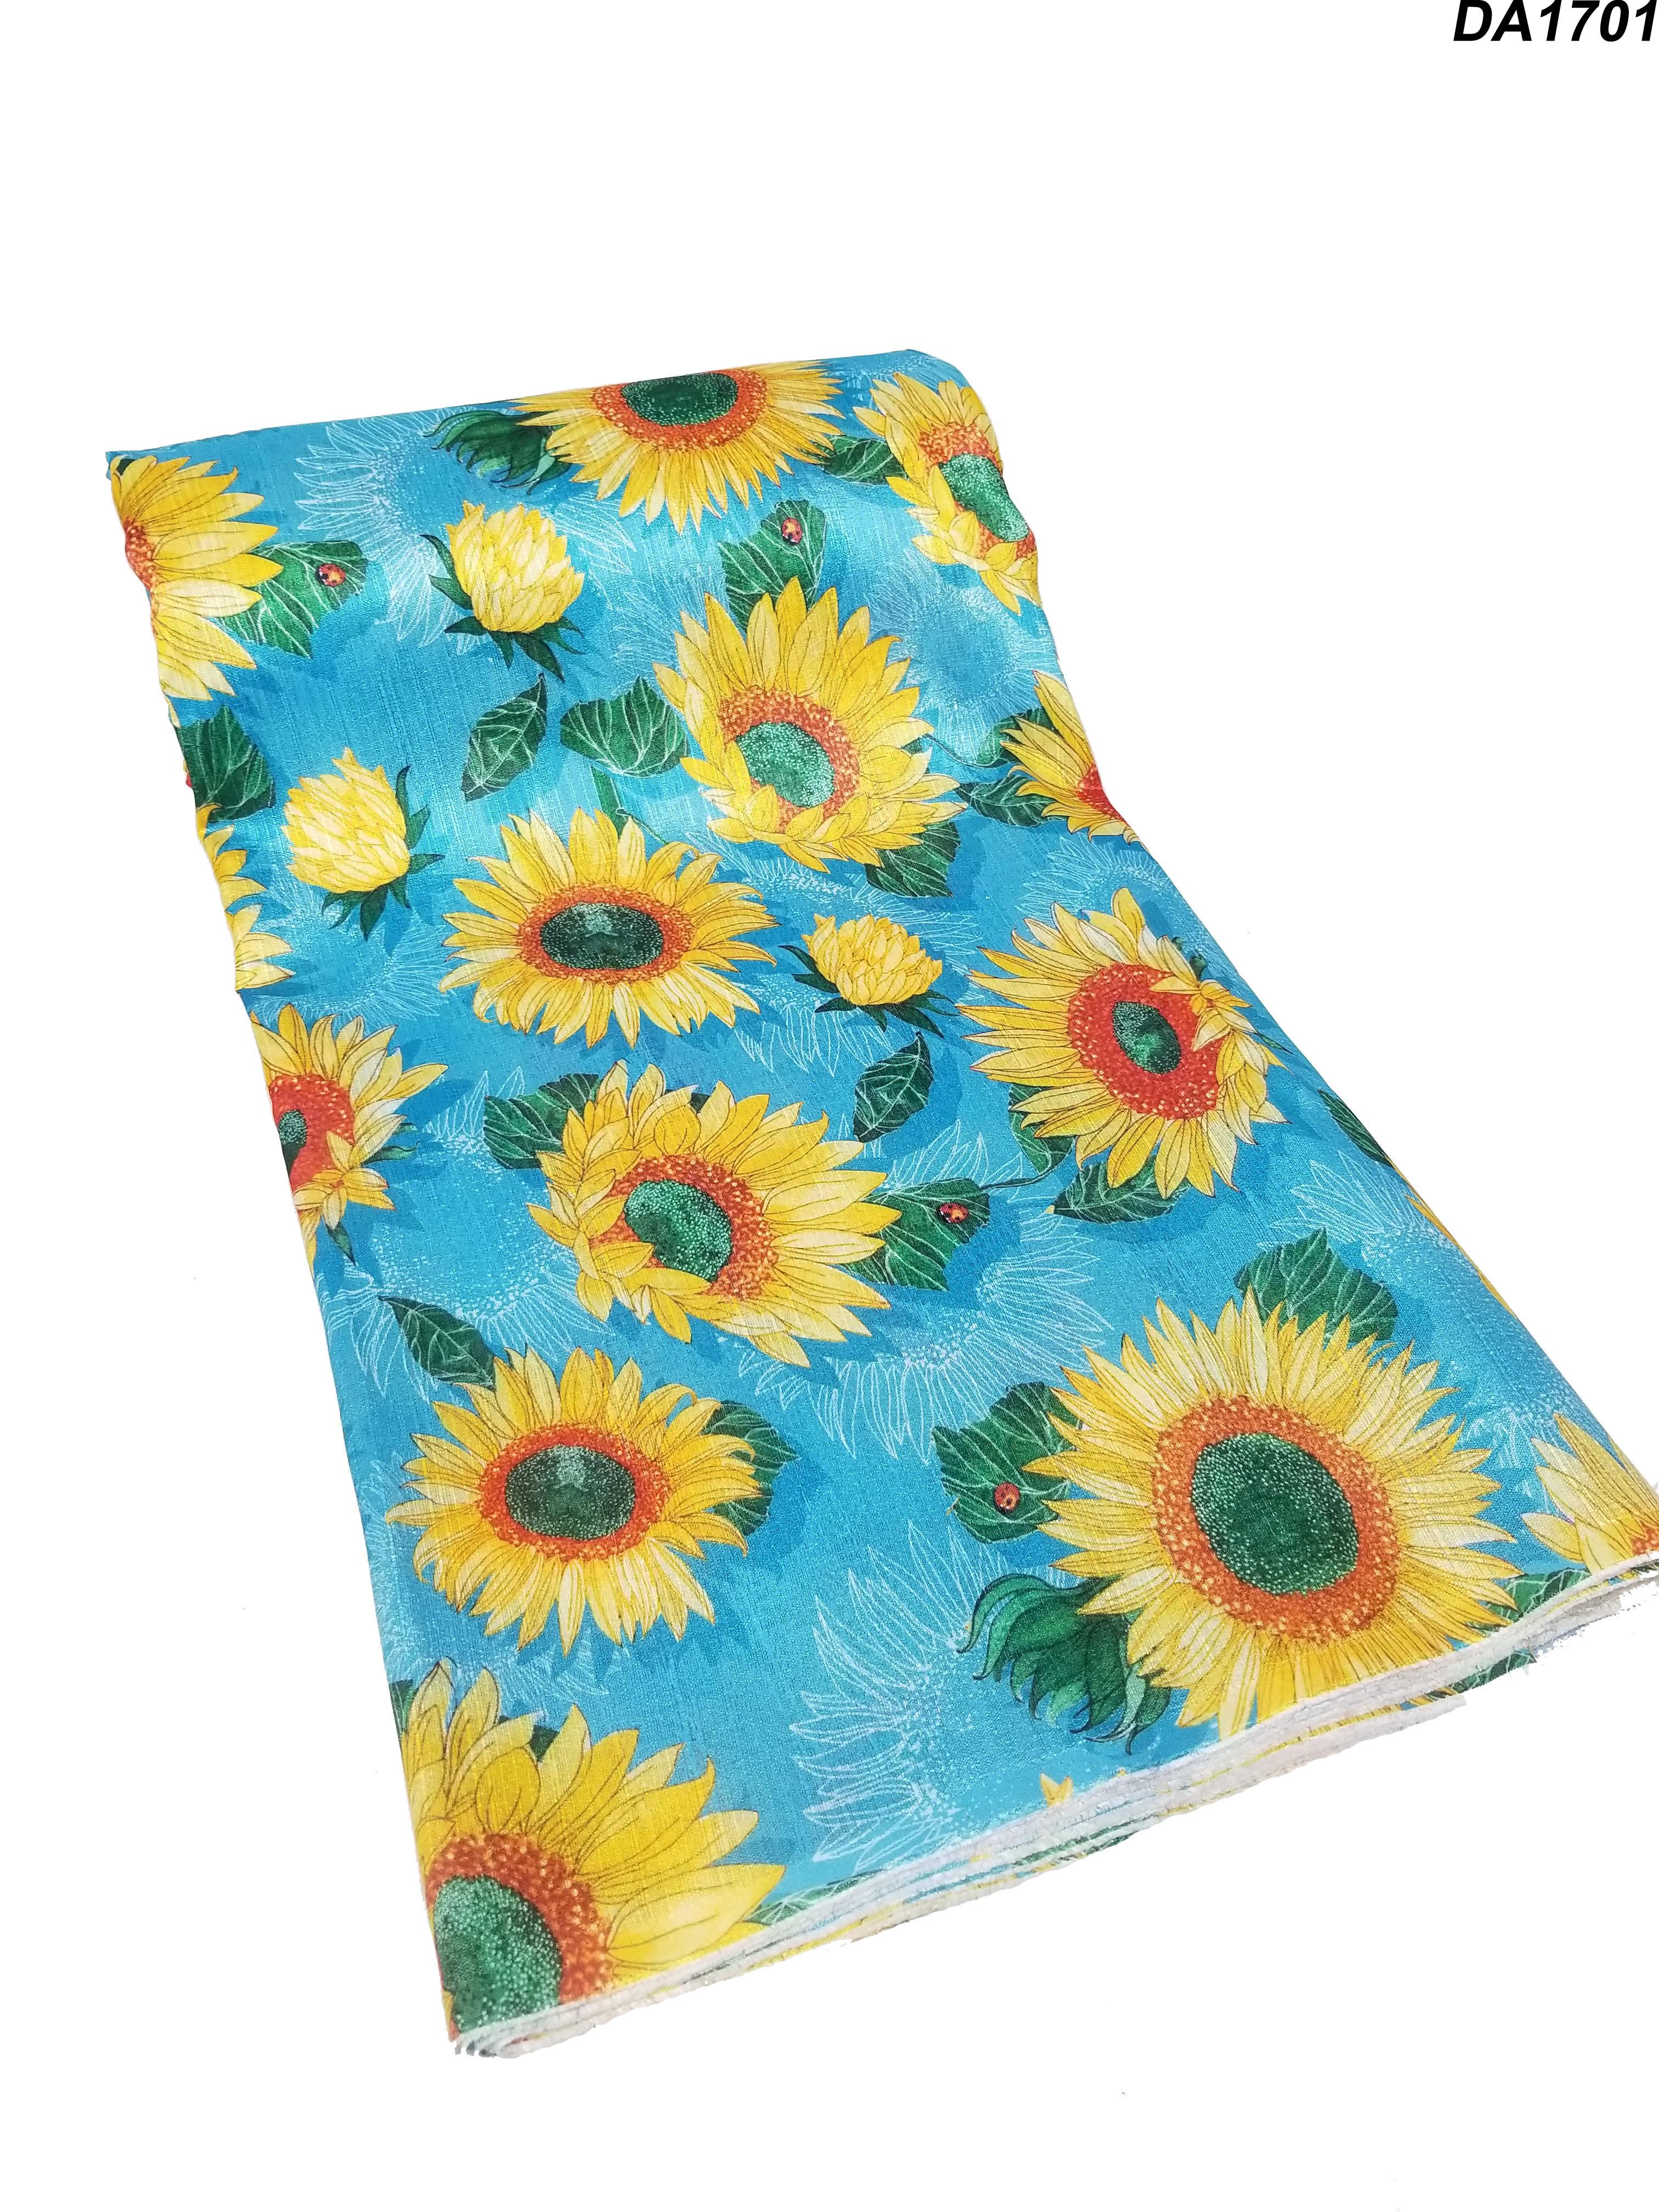 Fancy Malbari Silk Digital Sunflower Print Fabric Unstitch Material for Women's Clothing (Size-2.5 Meter Cut, 44